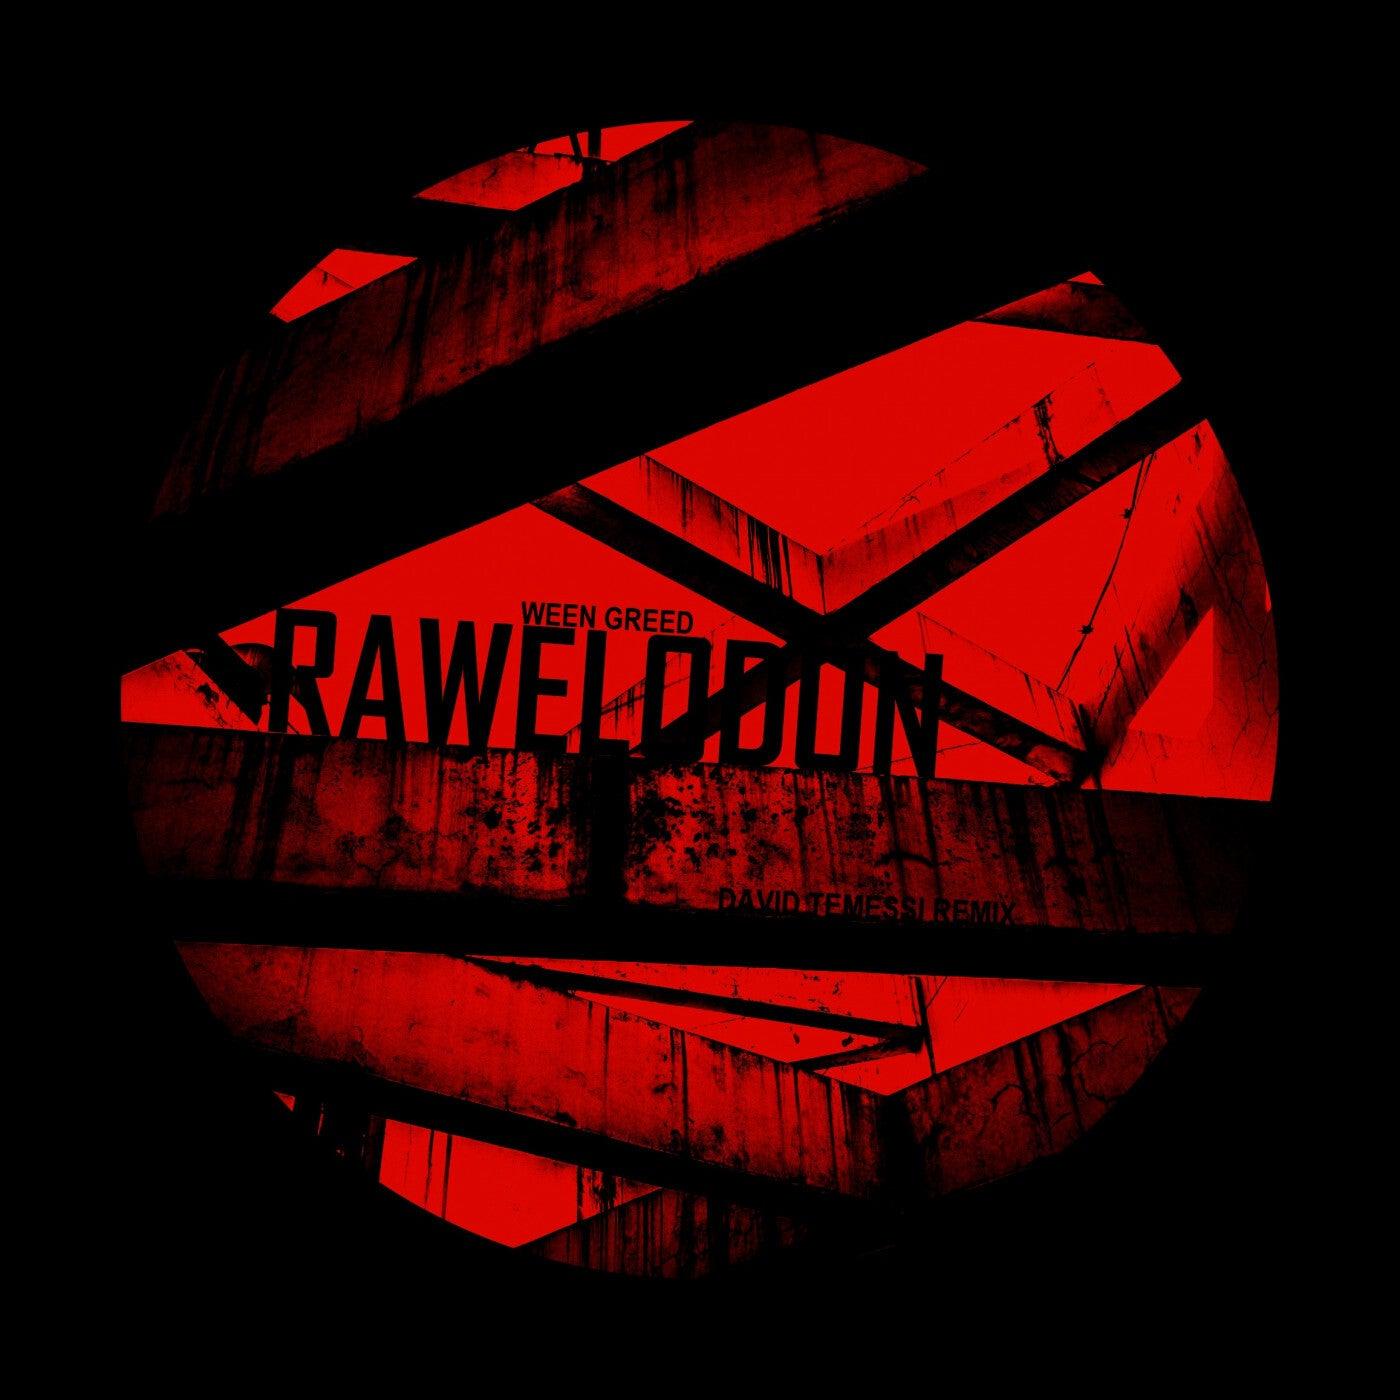 Rawelodon (David Temessi Remix)